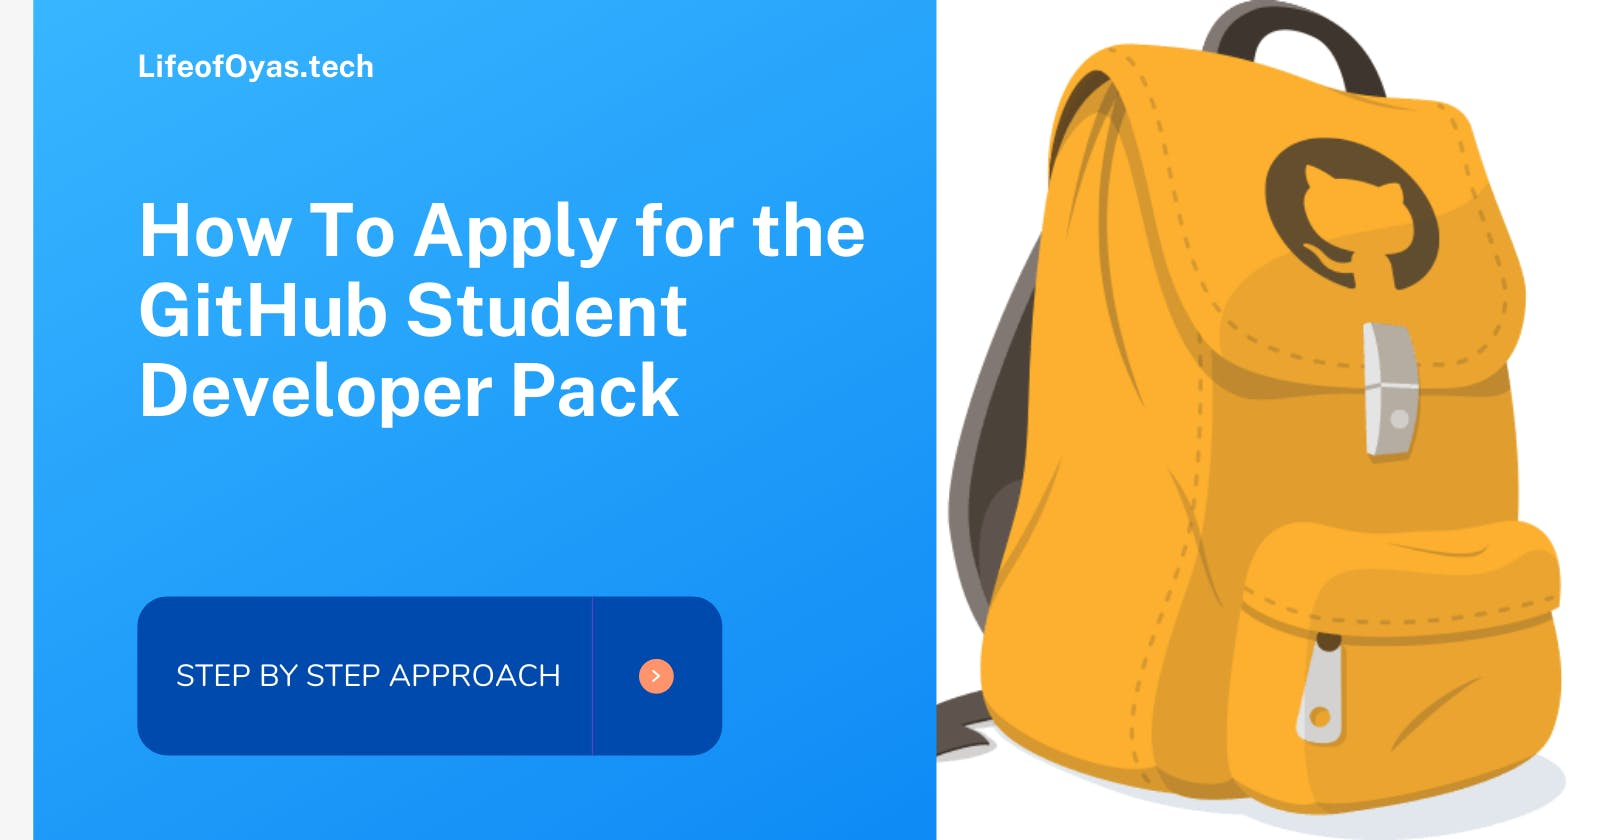 How To Apply For The Github Developer Student Pack